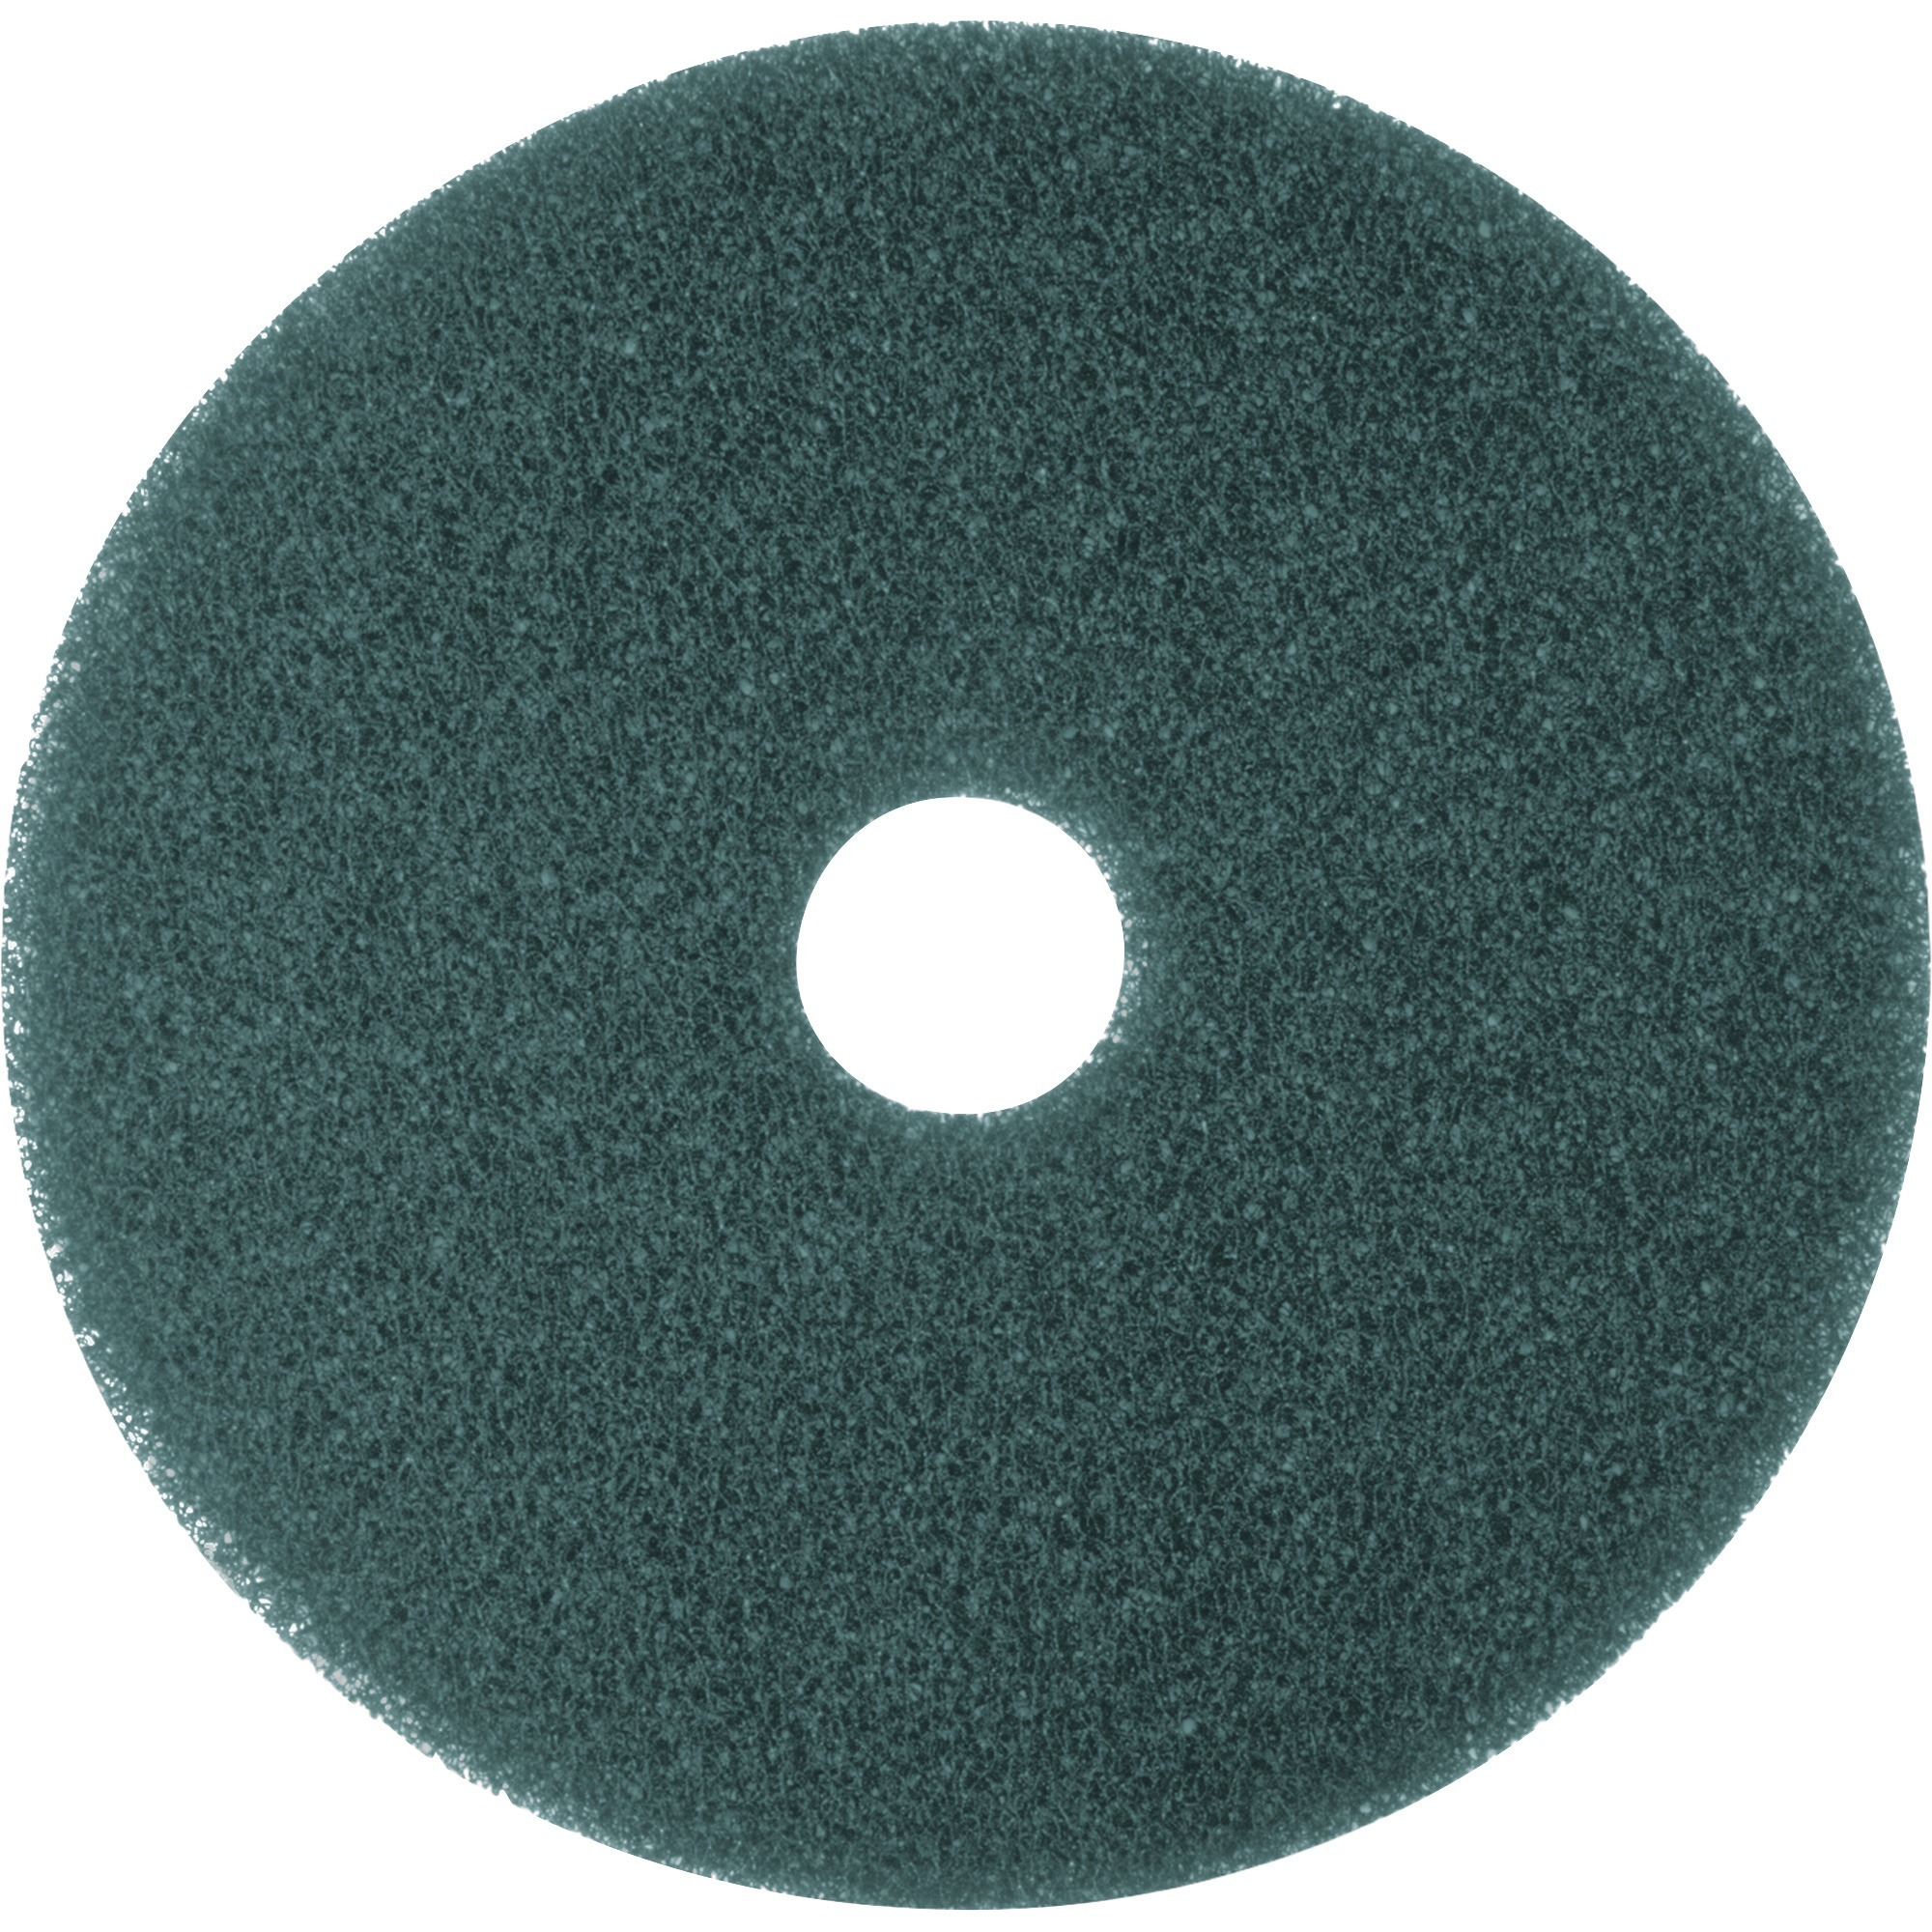 3M, MMM08410, Blue Cleaner Pads, 5 / Carton, Blue